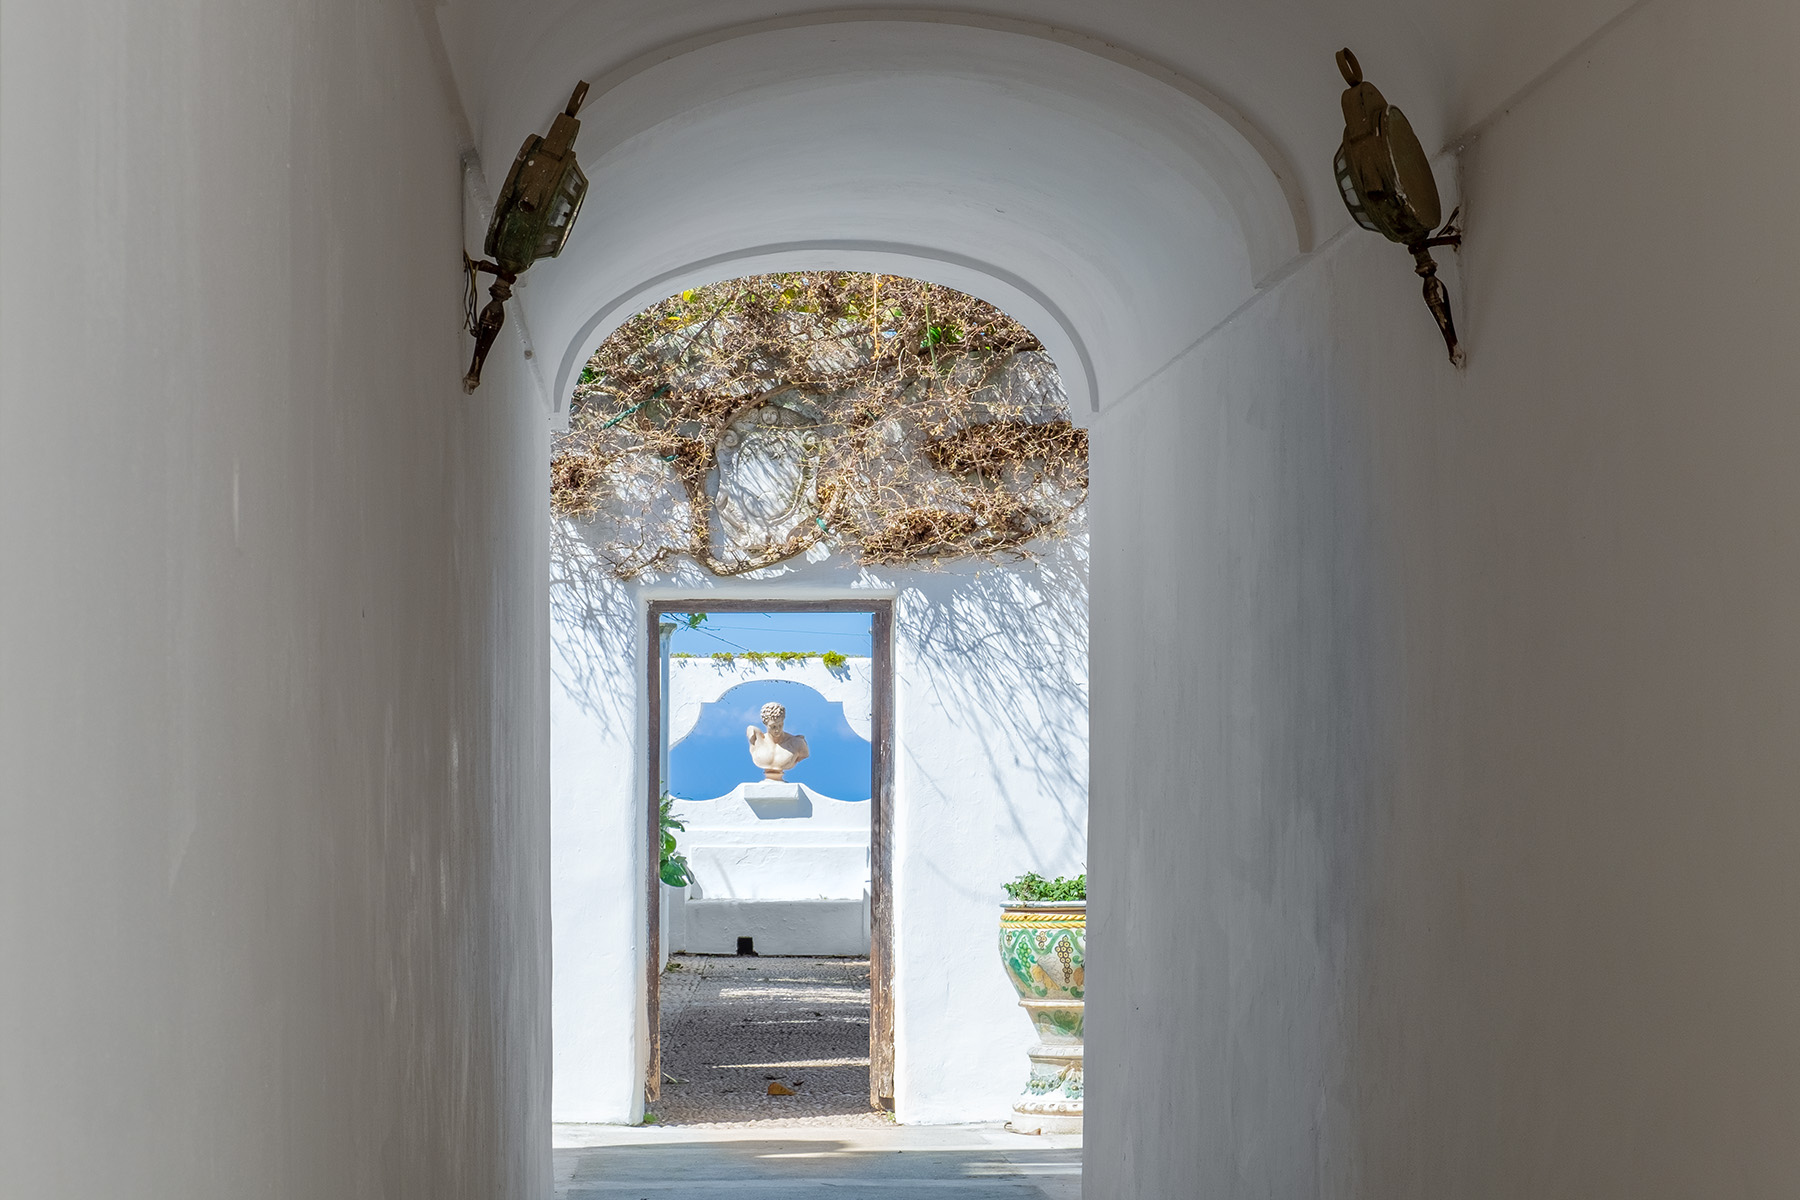 Casa indipendente in Vendita a Capri: 5 locali, 300 mq - Foto 22